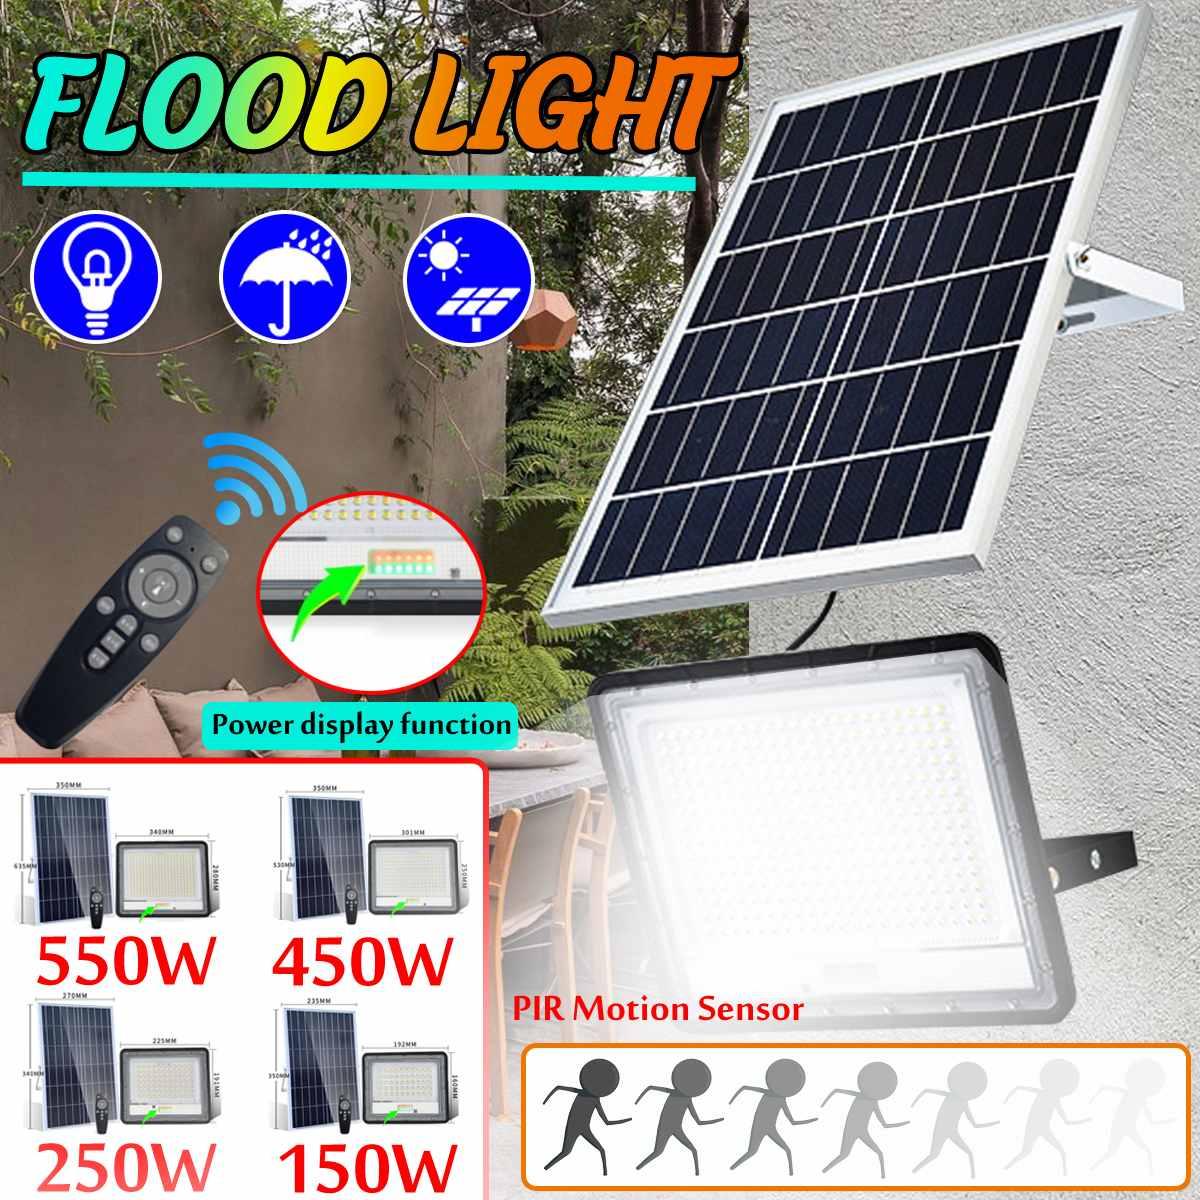 150/250/450/550W Solar Flood Lights Outdoor Floodlight Motion Sensor Led Light Waterproof Wall Lamp Solar Lamp Garden Lighting